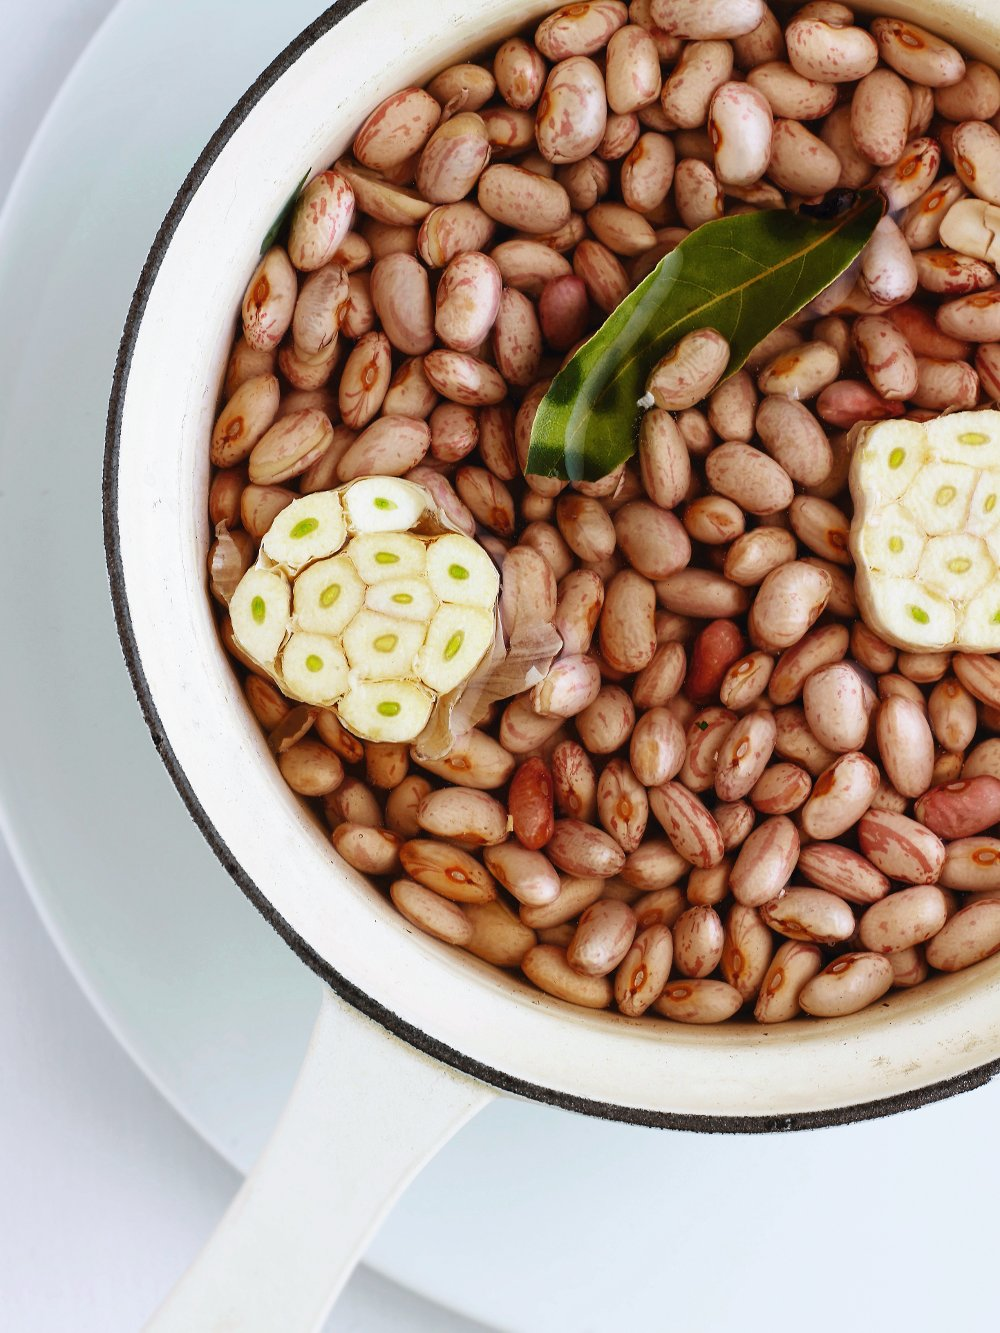 soaked-borlotti-beans-with-garlic-and-bay-leaf.bin